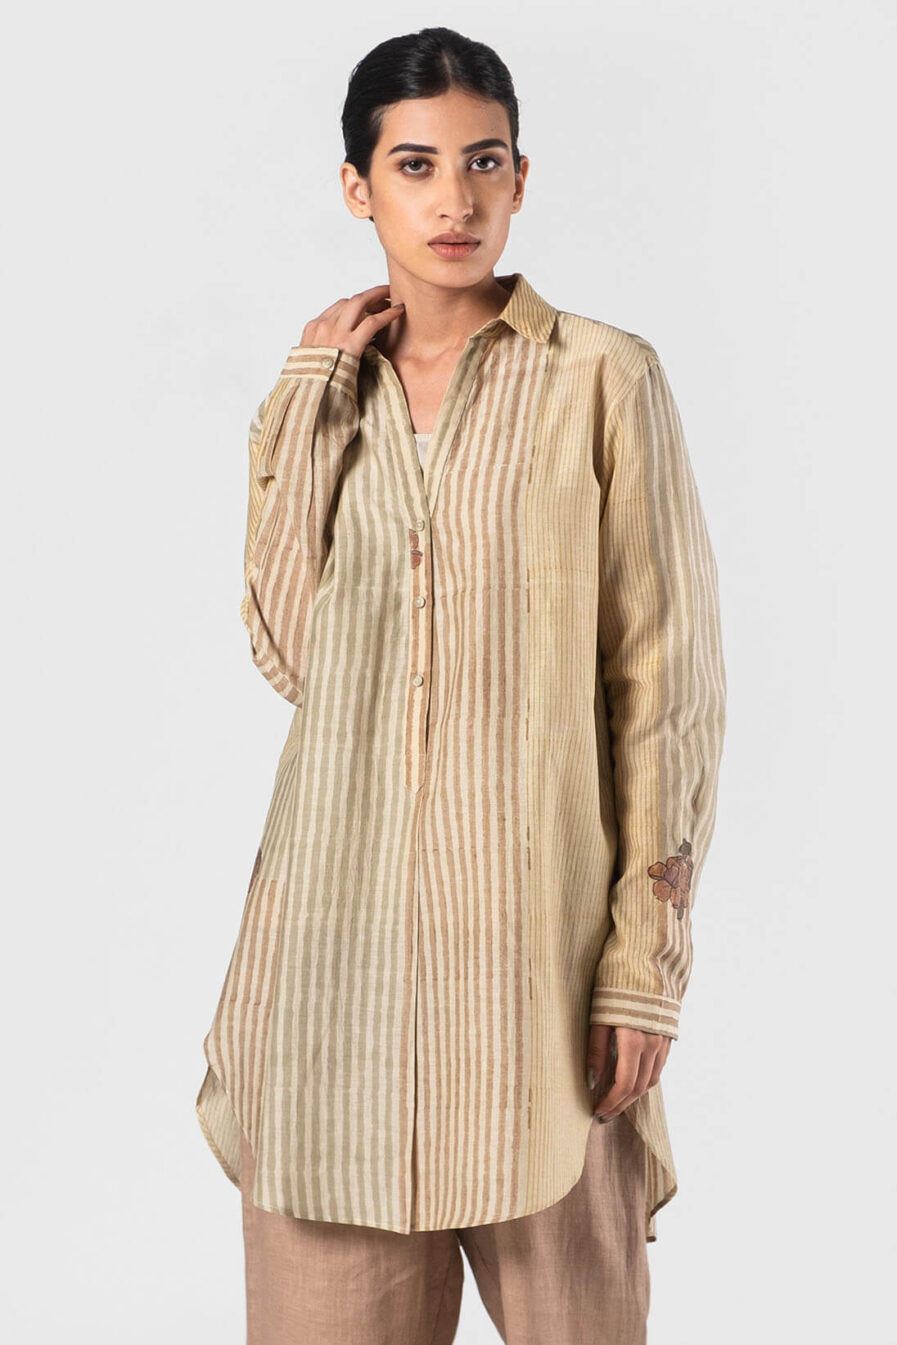 Anavila Beige Brooke shirt printed-stripes